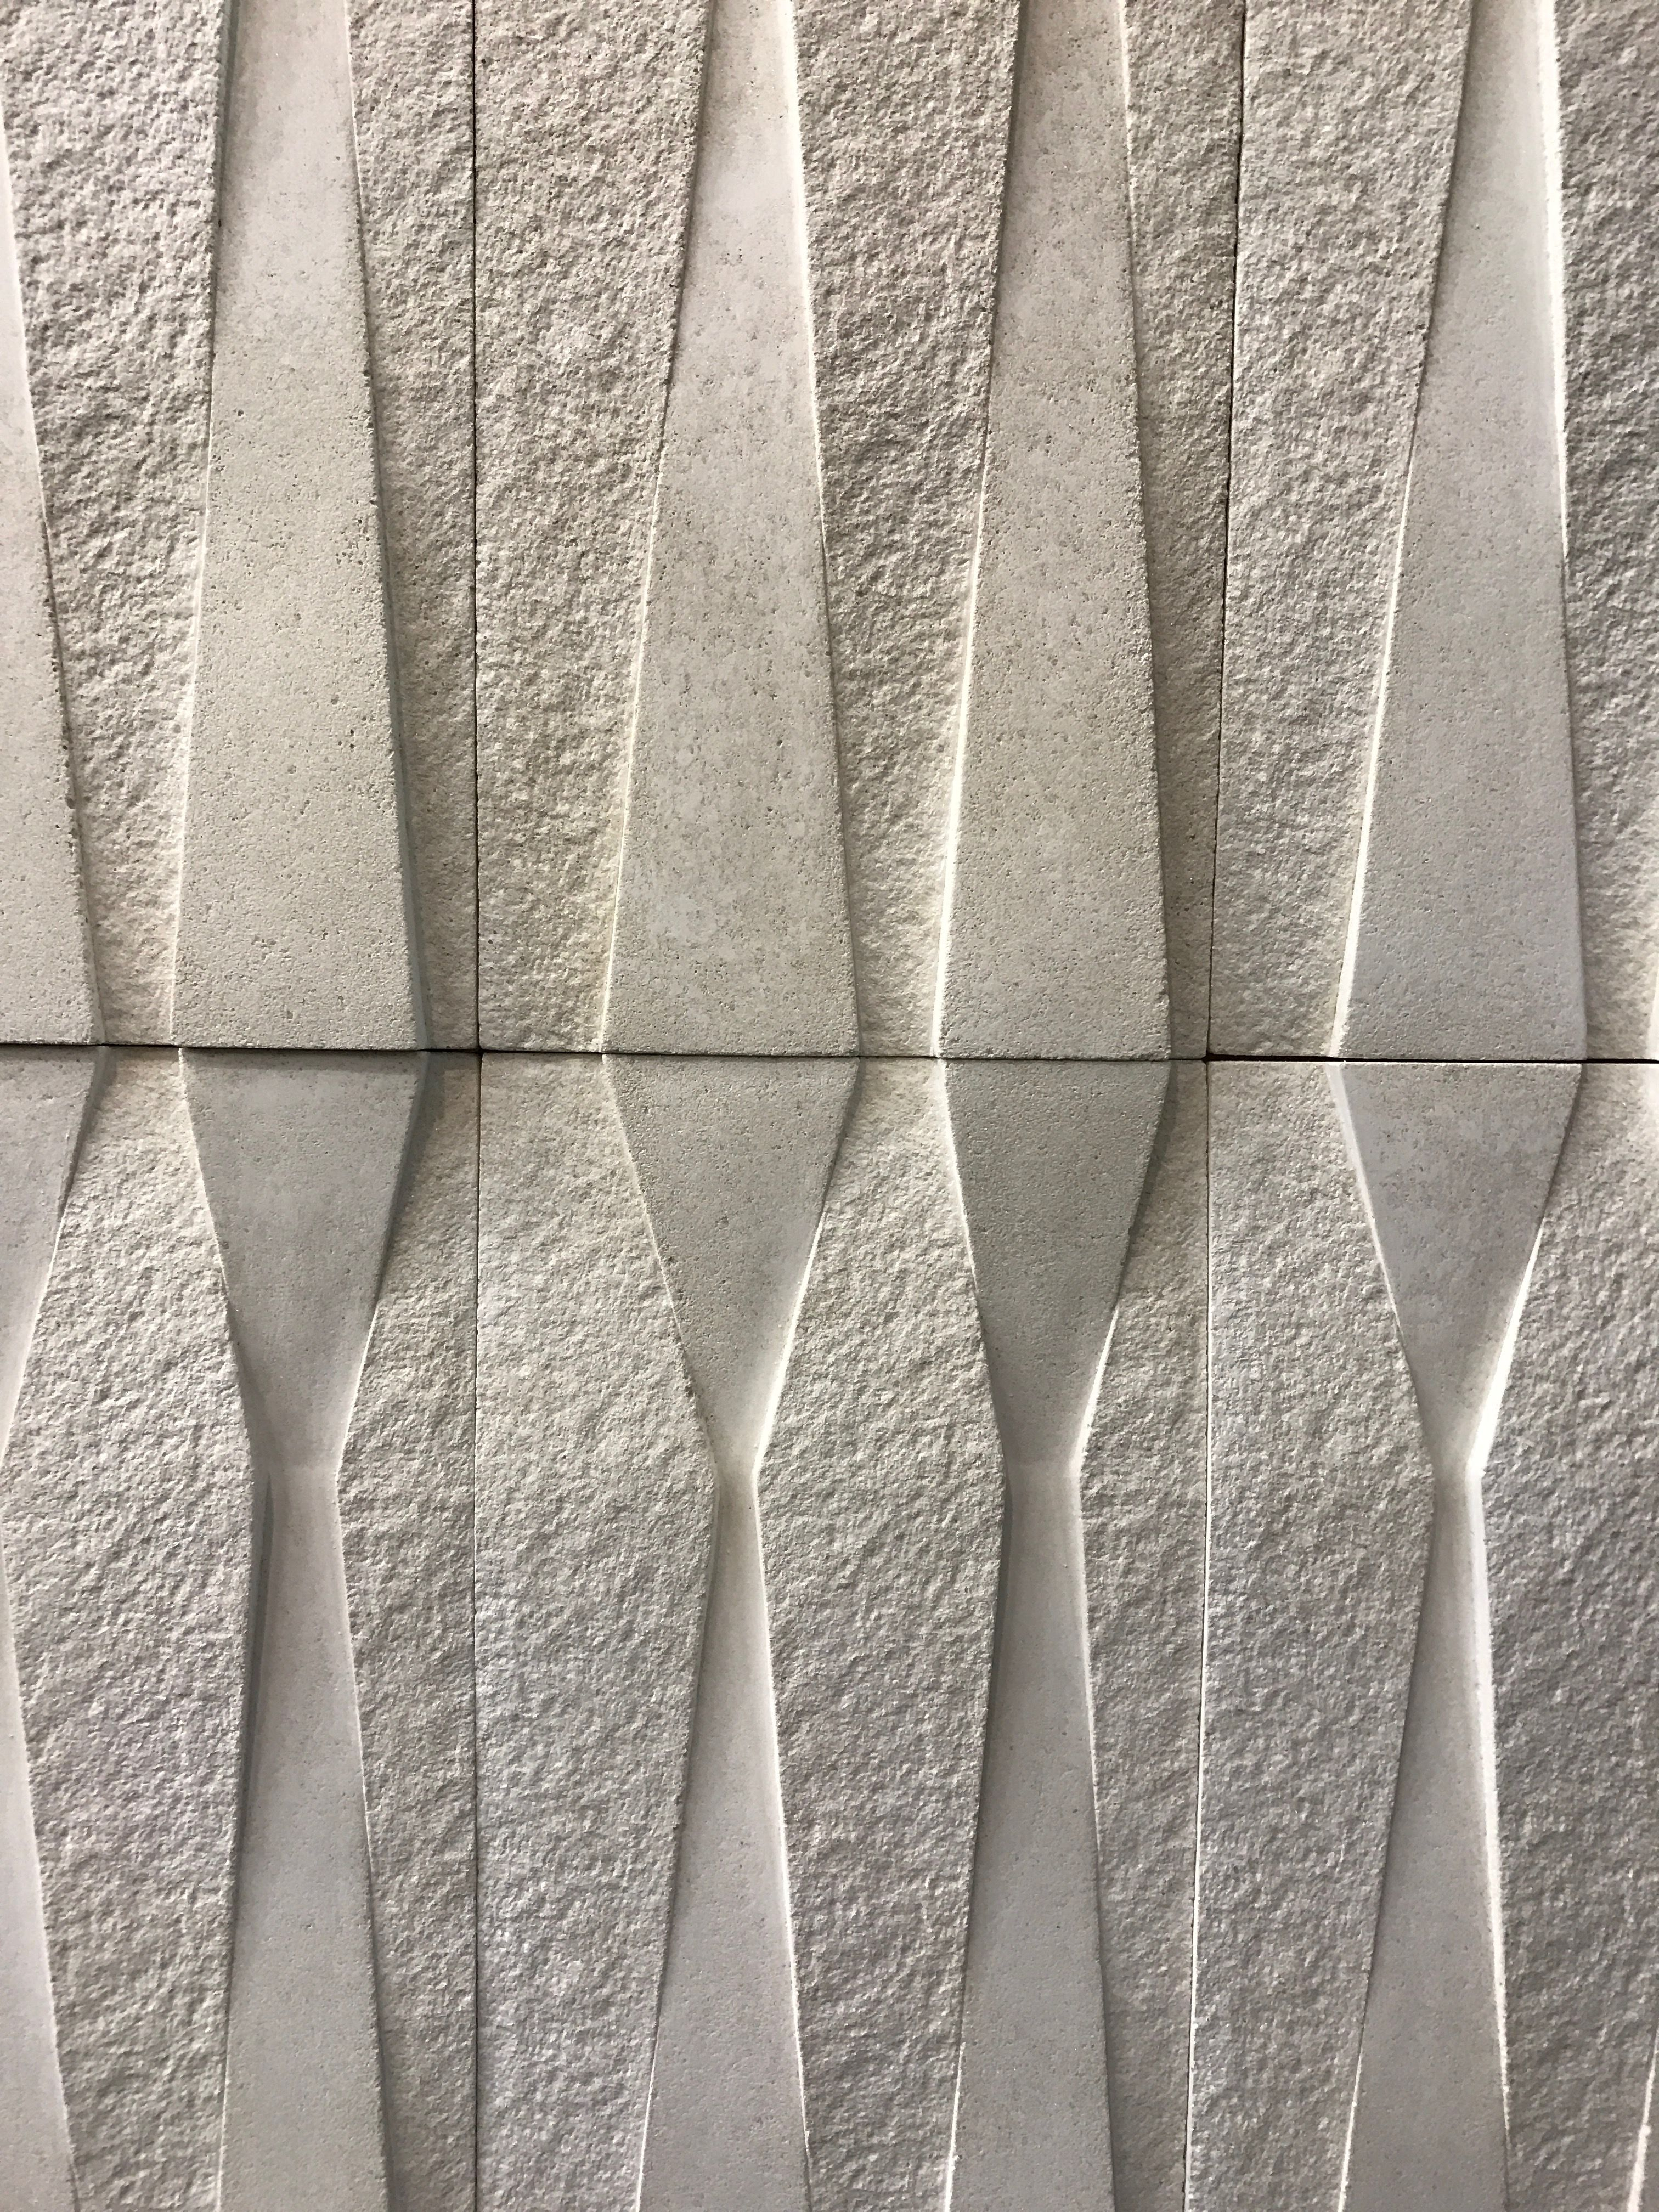 Pin By Abhi Korat On Walls Wall Patterns